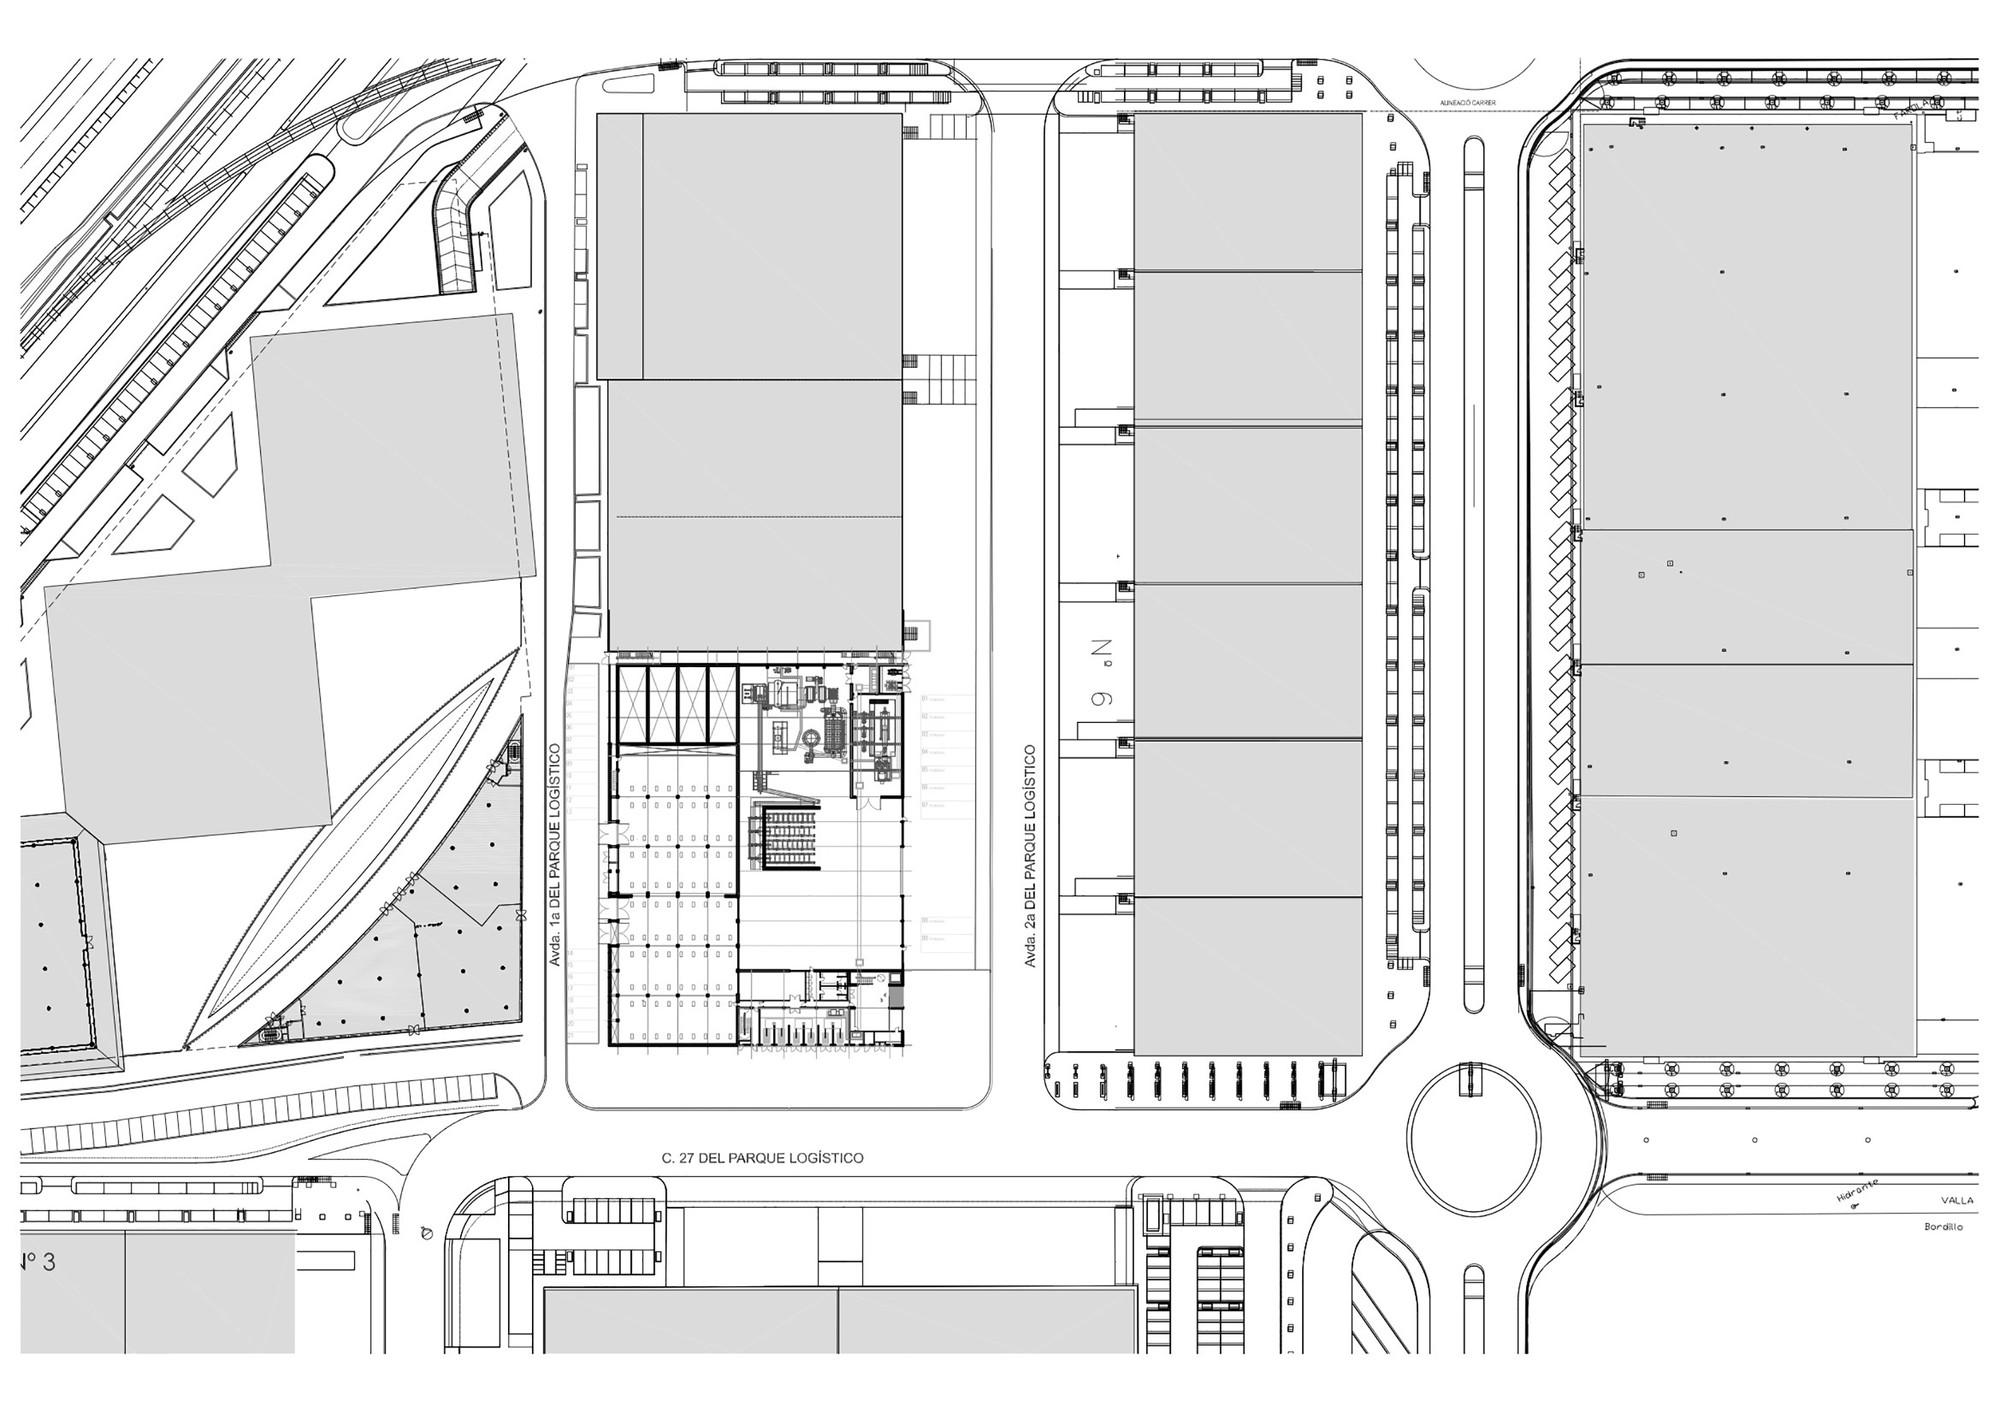 Gallery Of Barcelona Sur Power Generation Plant Forgas Arquitectes Generator Diagram Plantsite Plan